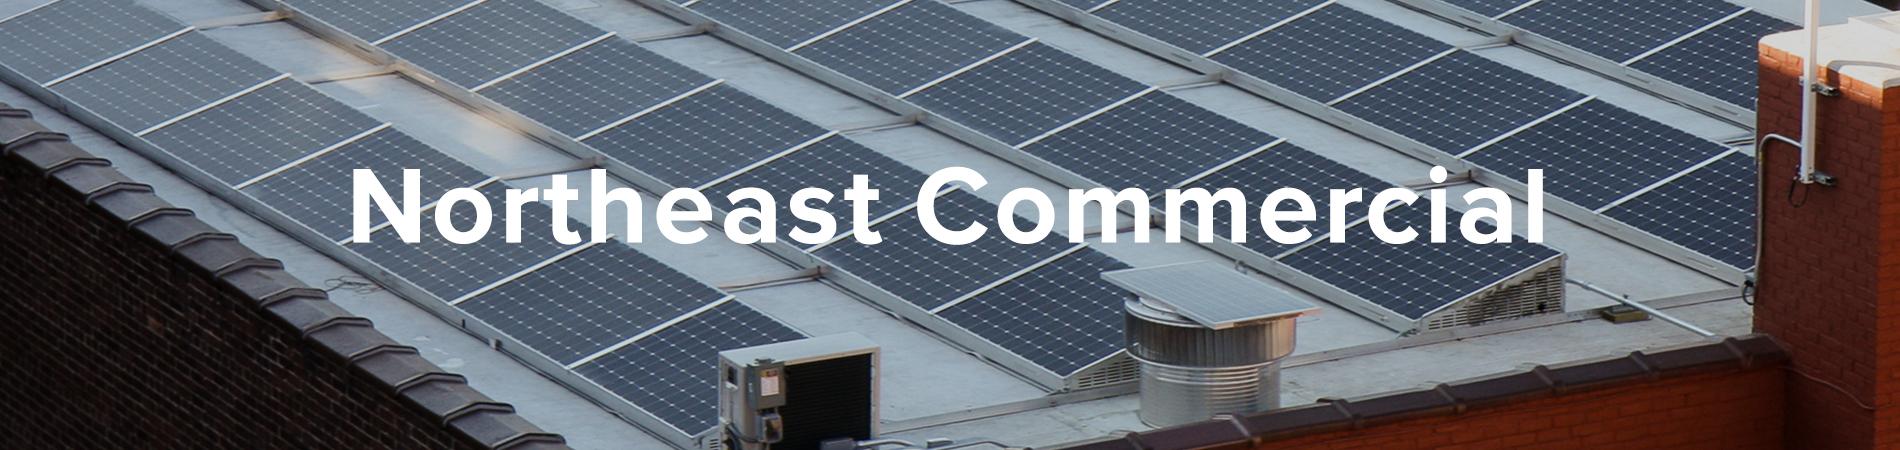 SunCommon Northeast commercial solar banner